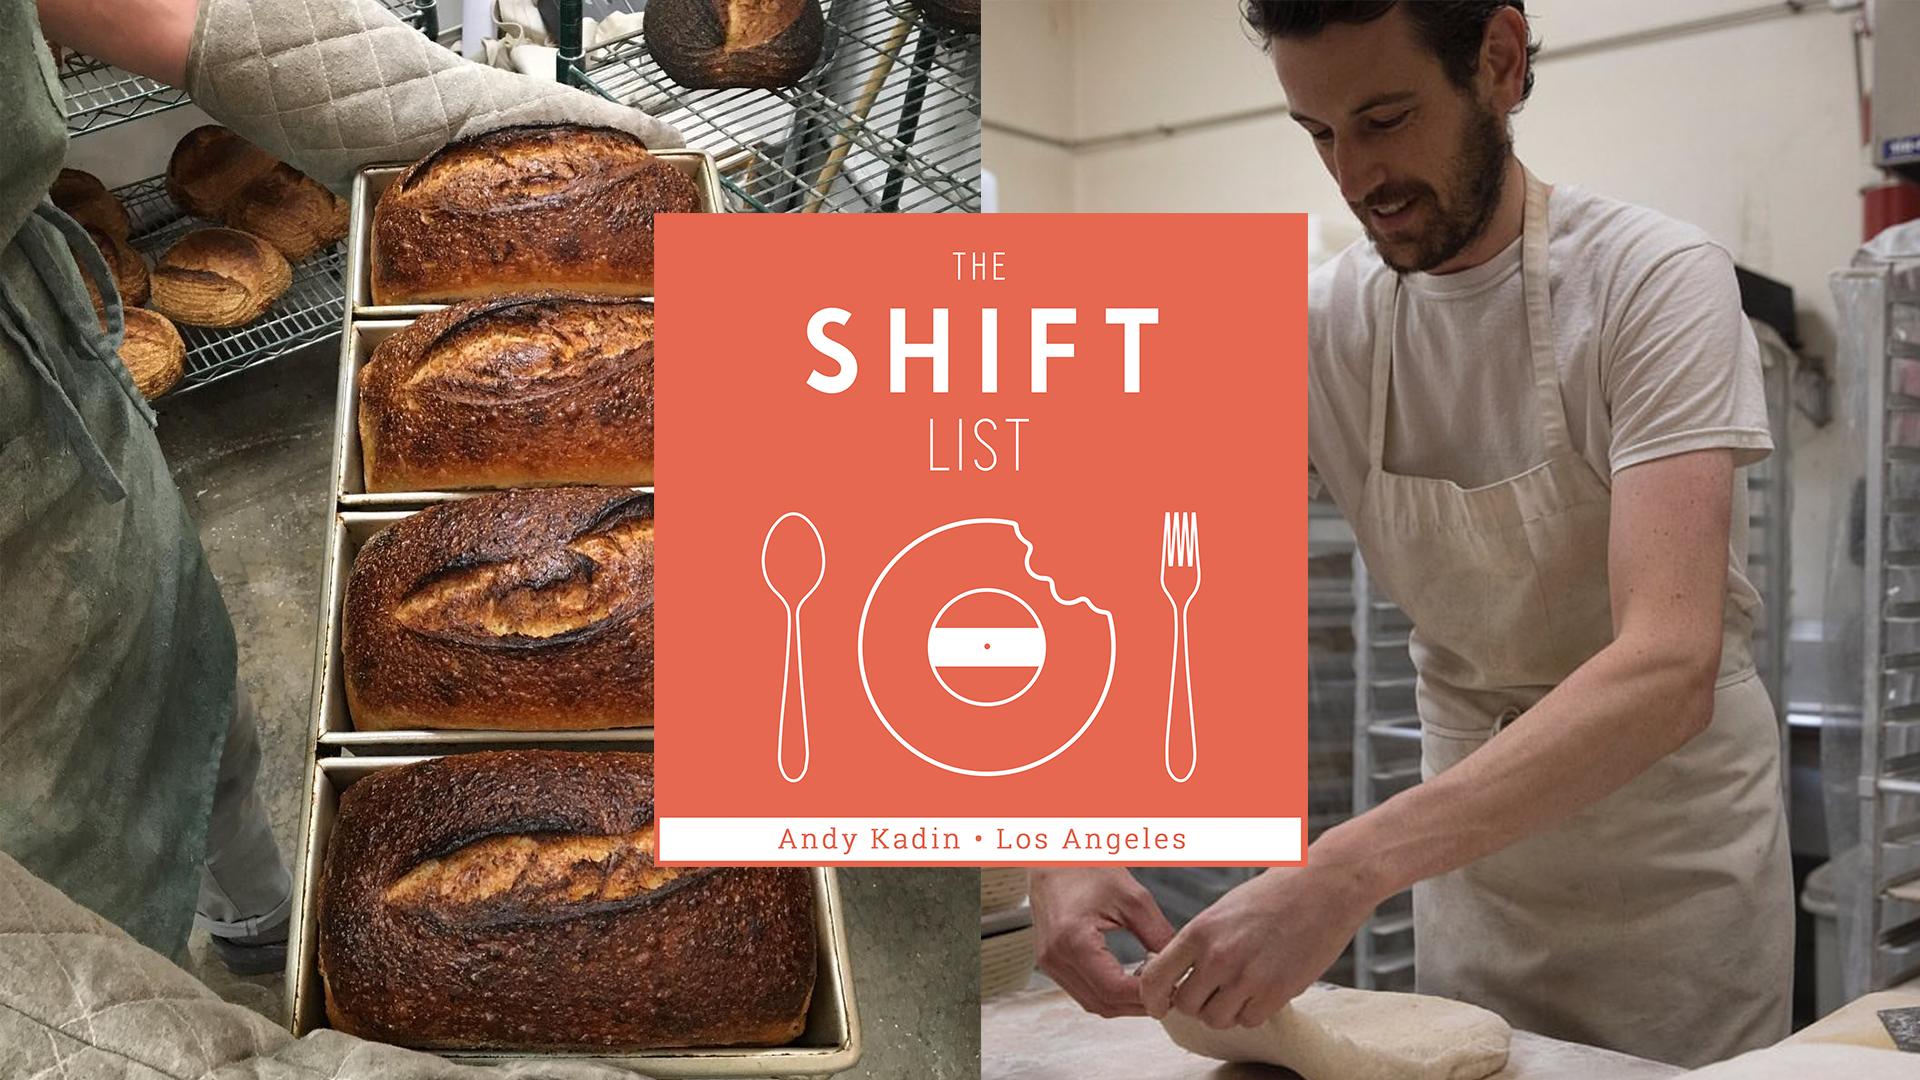 The Shift List - Andy Kadin (Bub and Grandma's Bakery) - Los Angeles